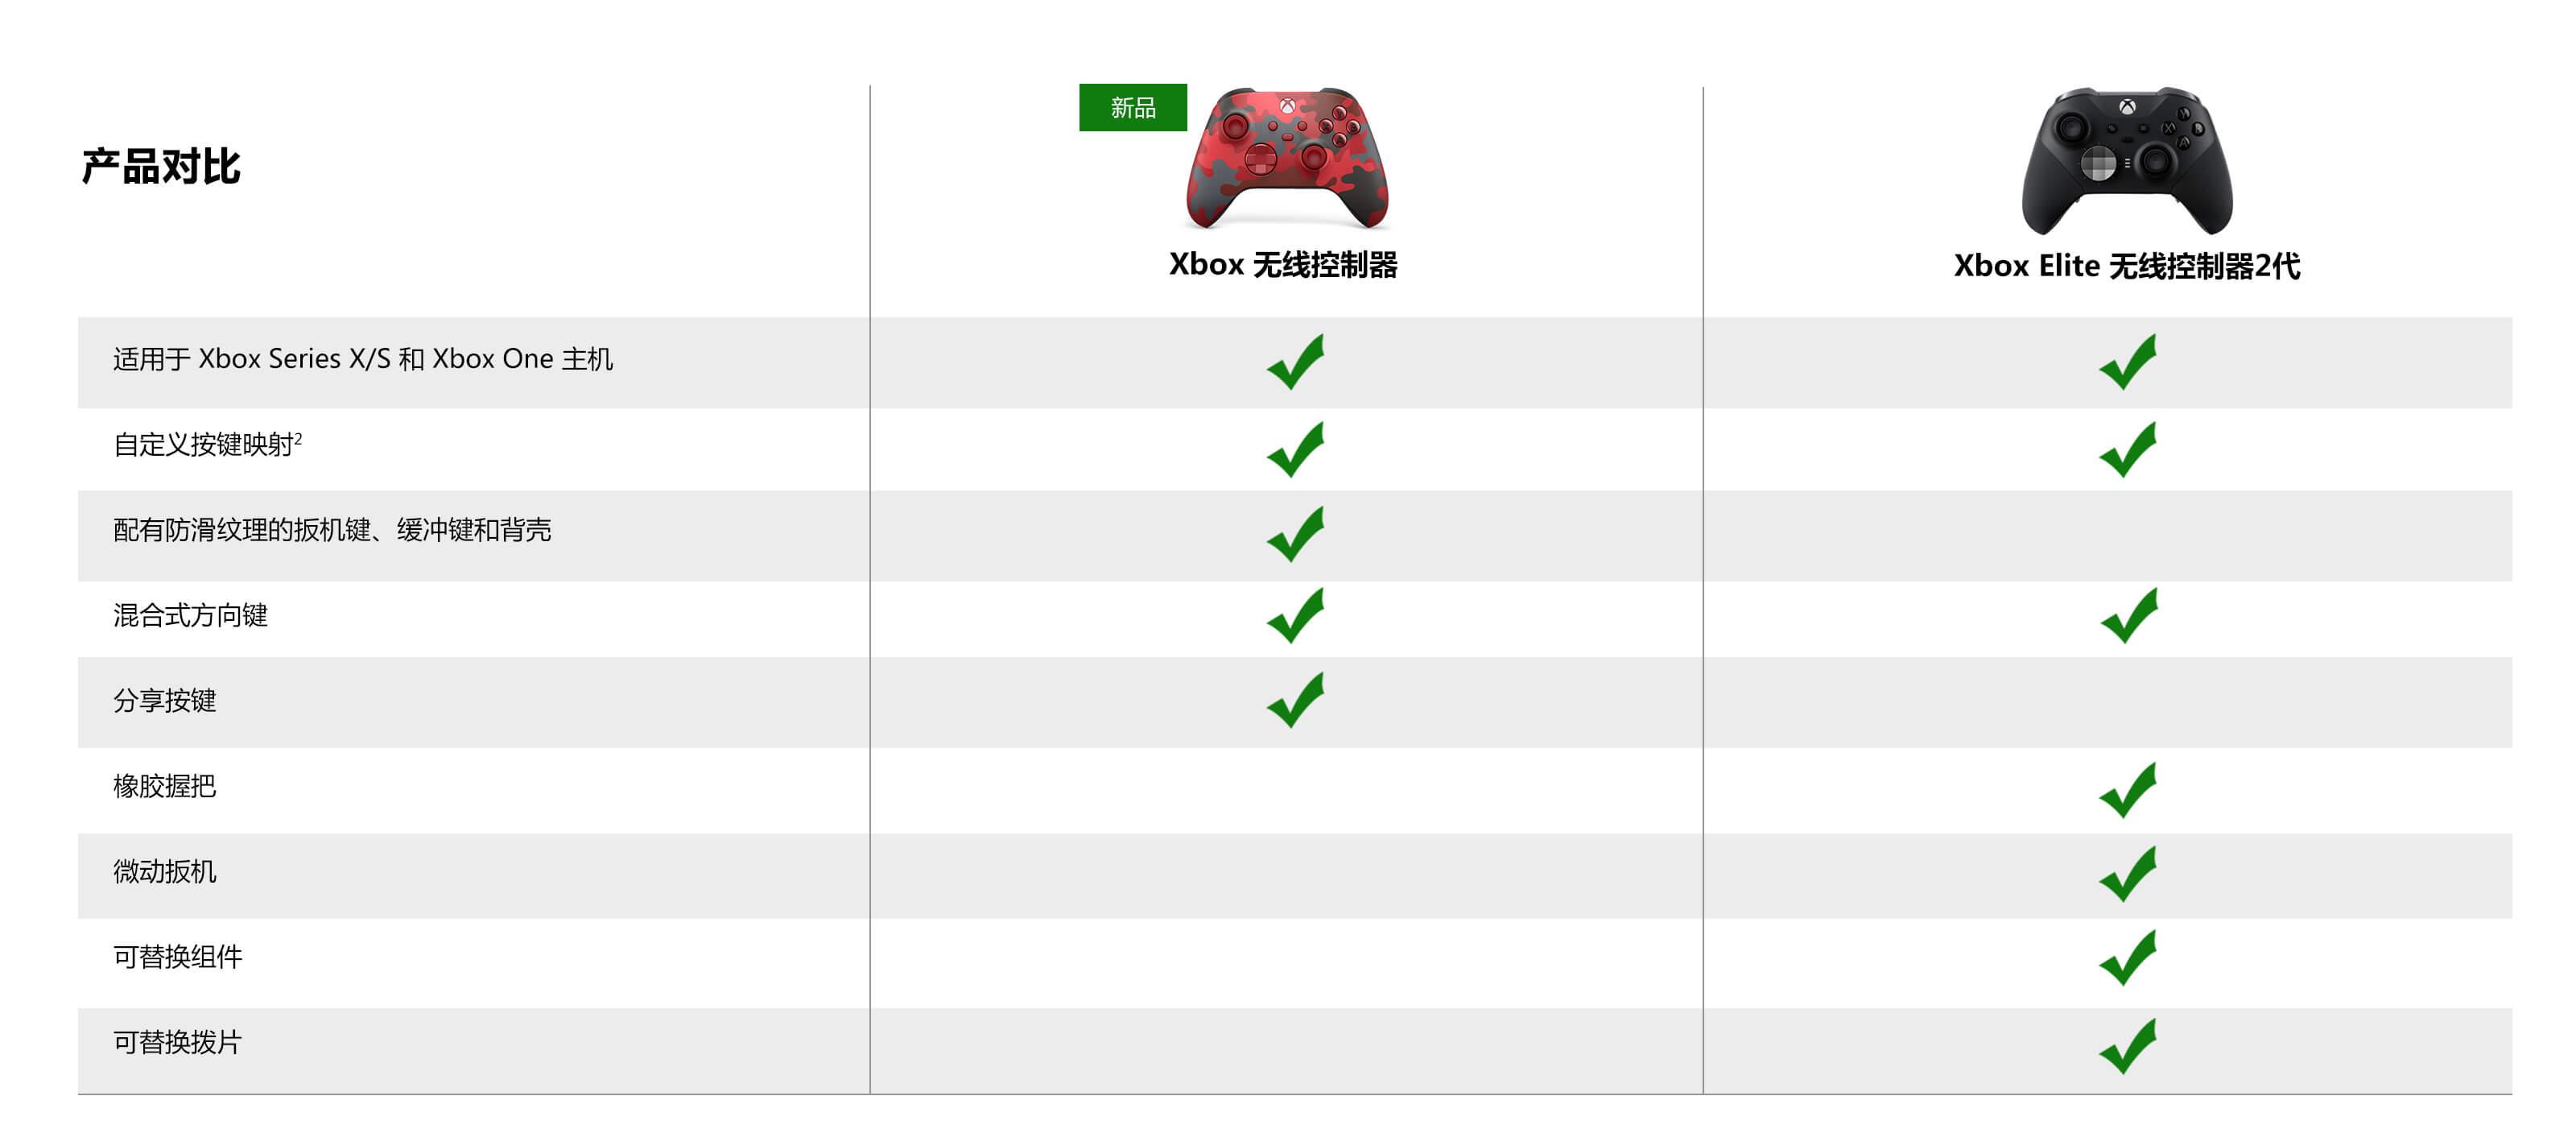 Xbox无线控制器与Xbox Elite无线控制器2代区别